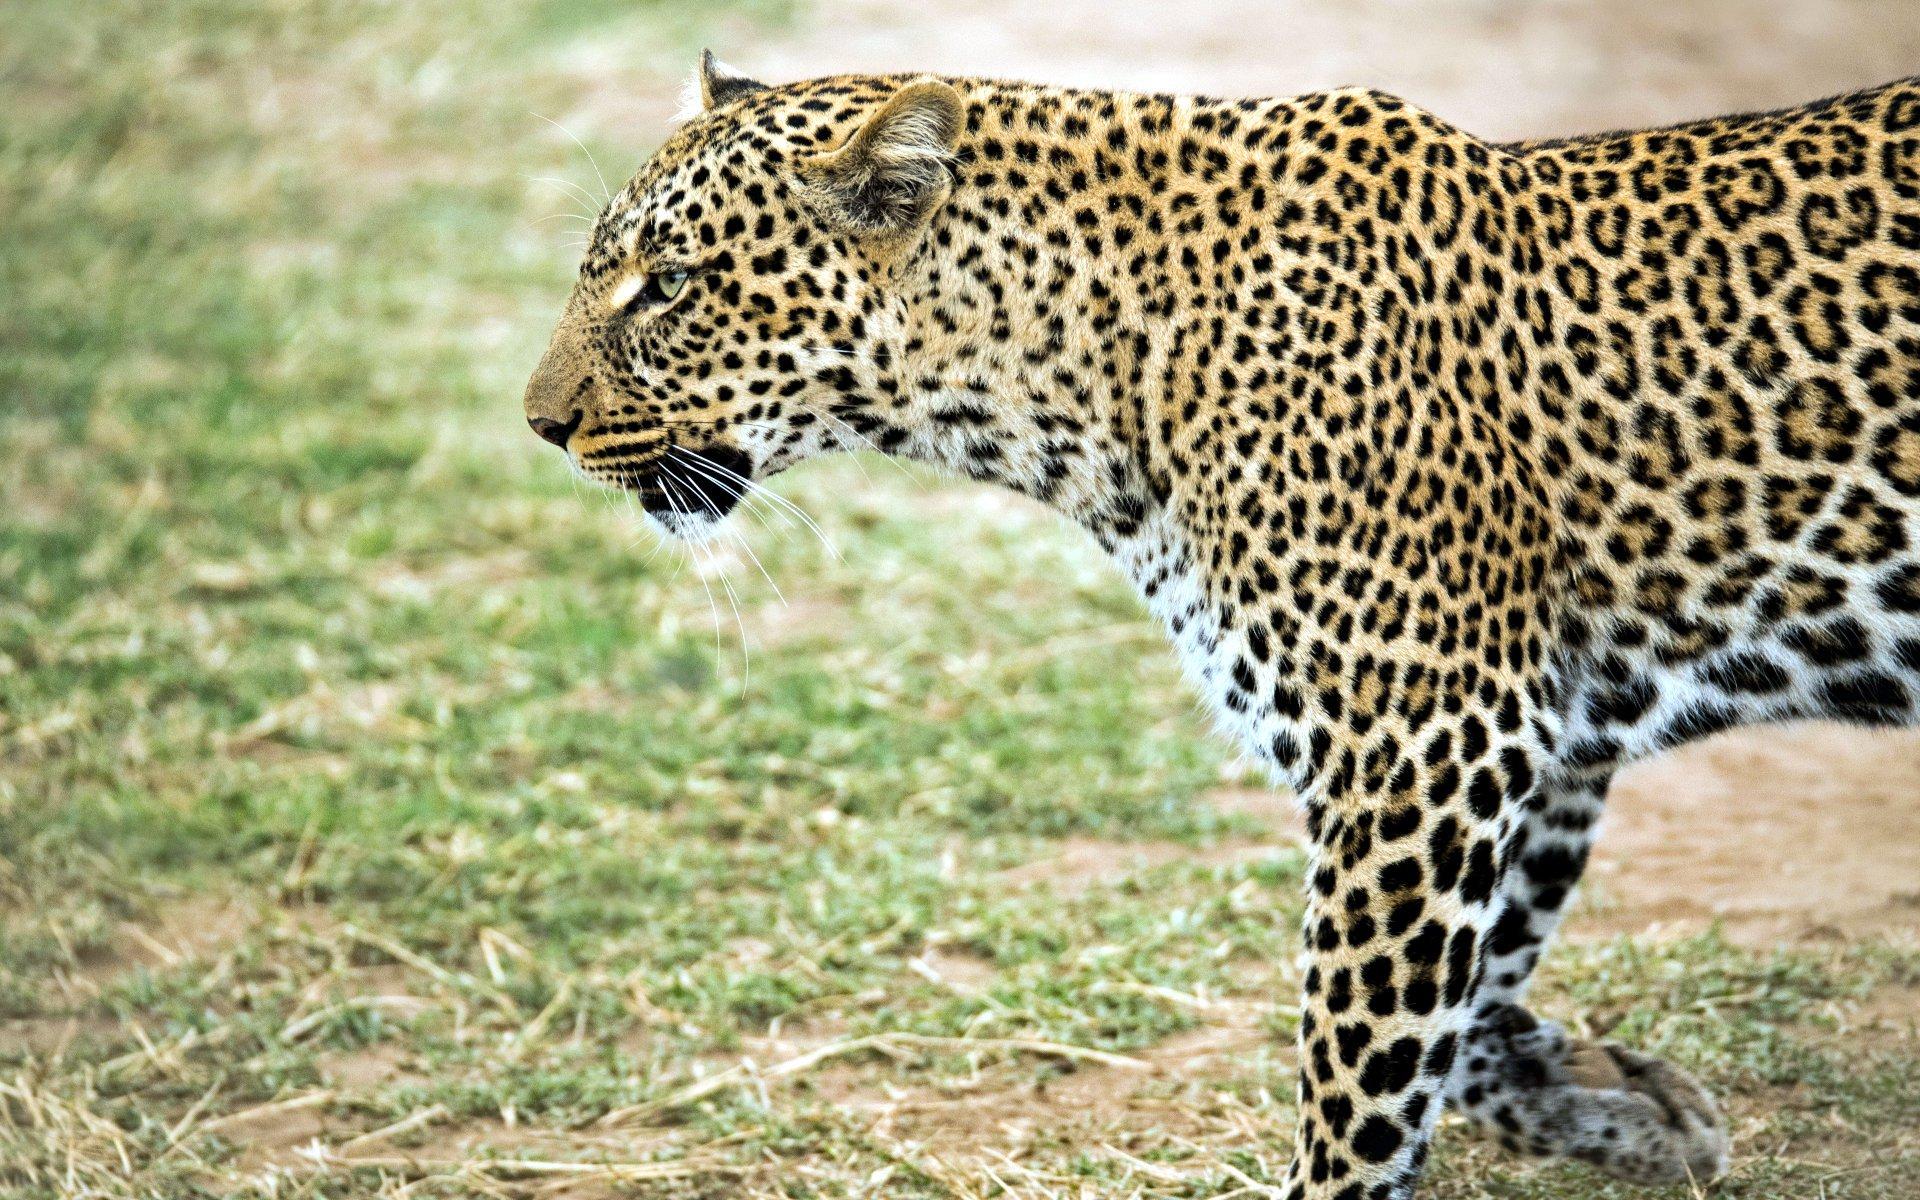 Places to spot Leopards: Samburu National Reserve, Masai Mara National Park, Meru National Park, and Tsavo National Park.